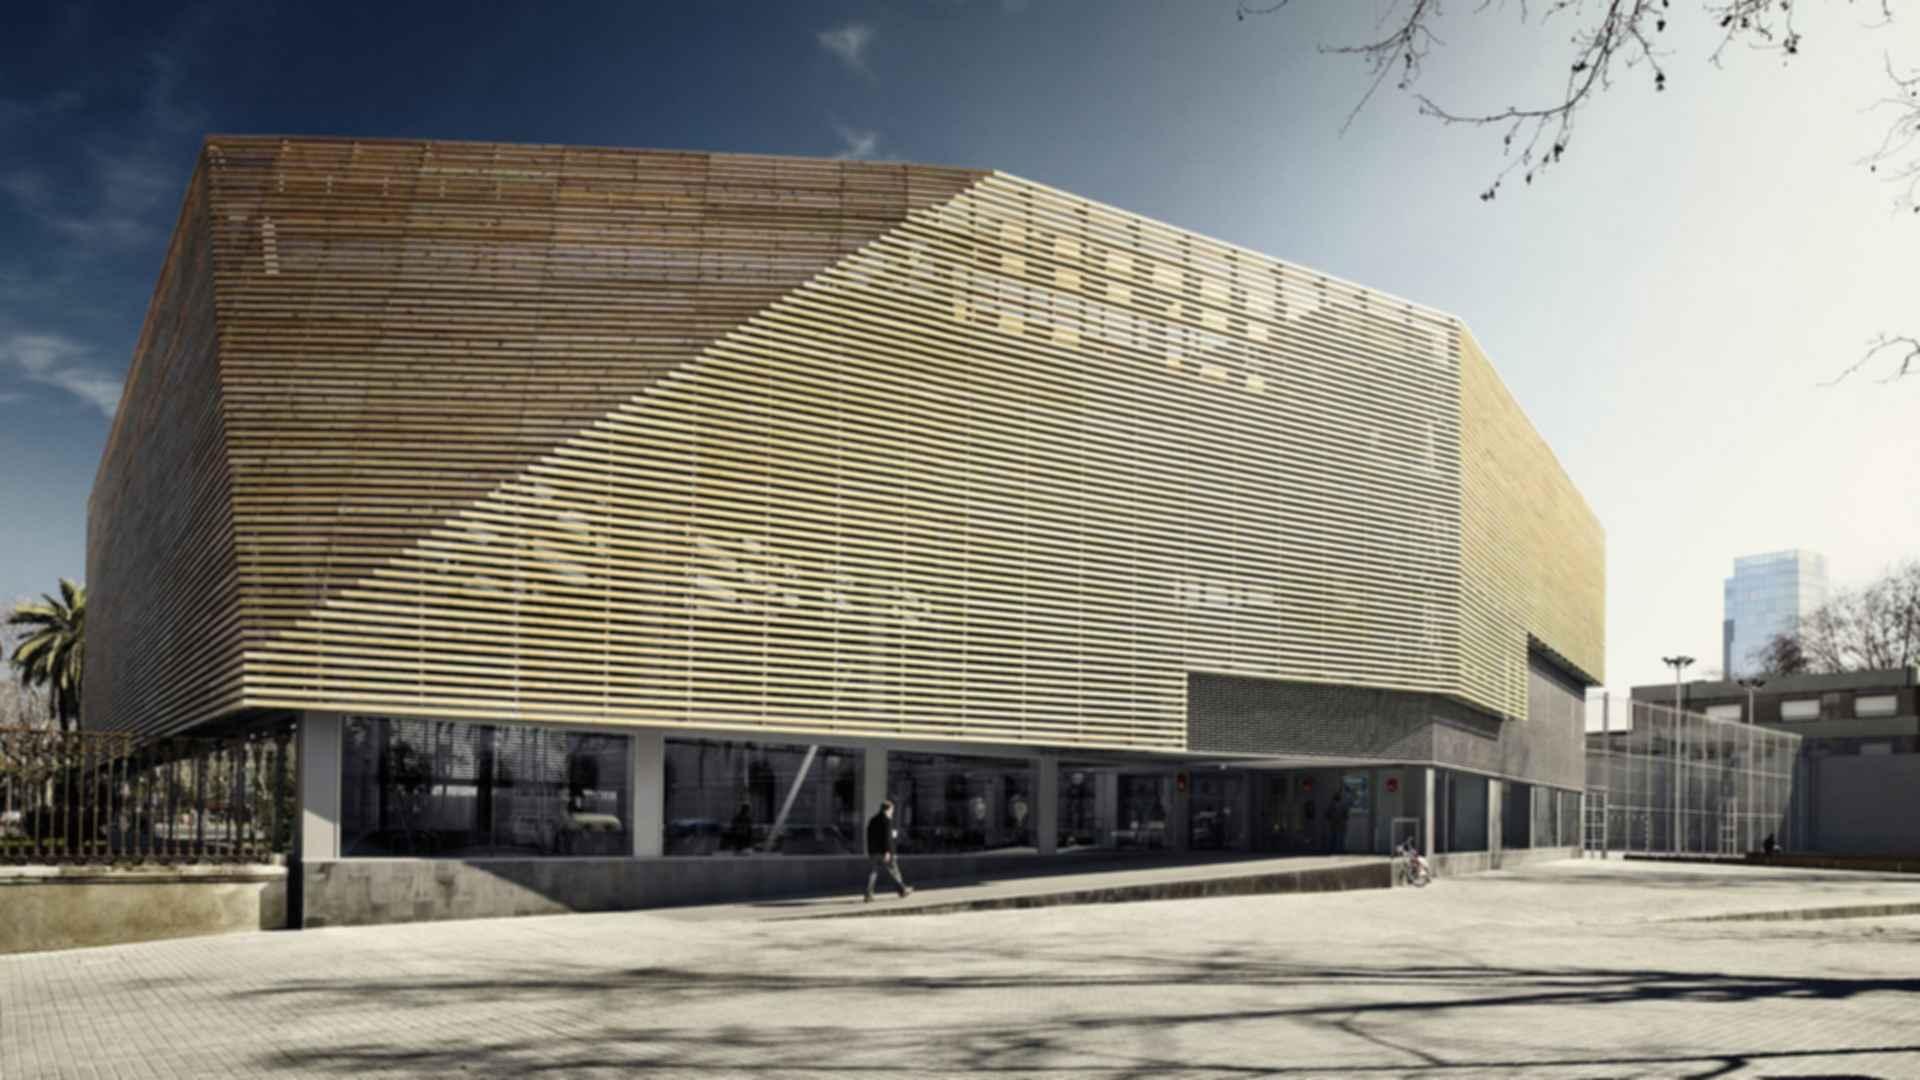 Ciutadella Park Sports Center - Exterior/Entrance